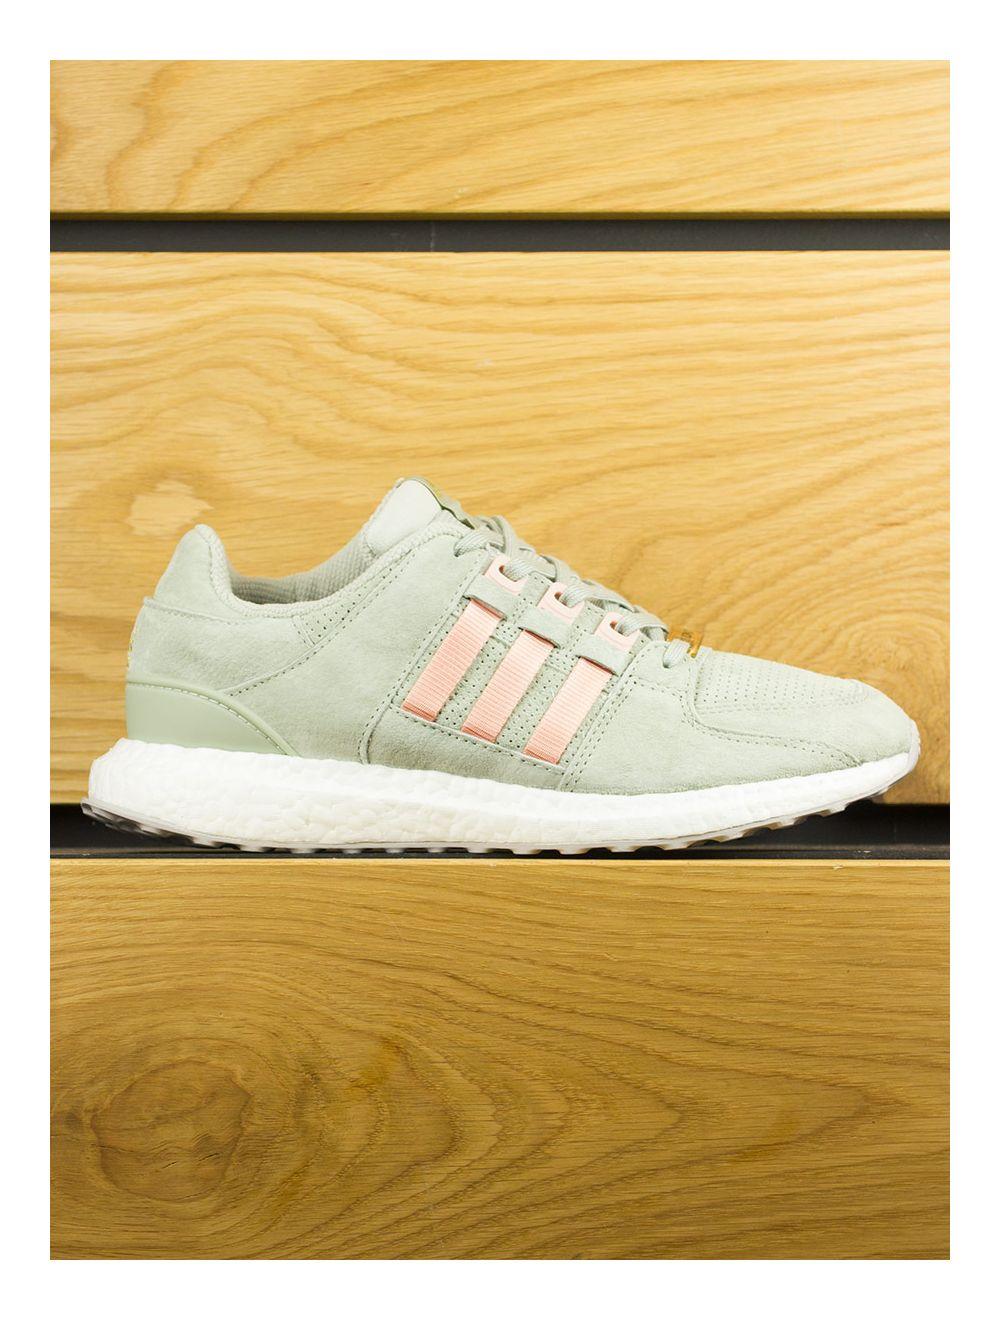 online retailer 8d214 6a5a6 Adidas Consortium x Concepts EQT Support 93/16 Ultra Boost - Pantone Clear  Granite